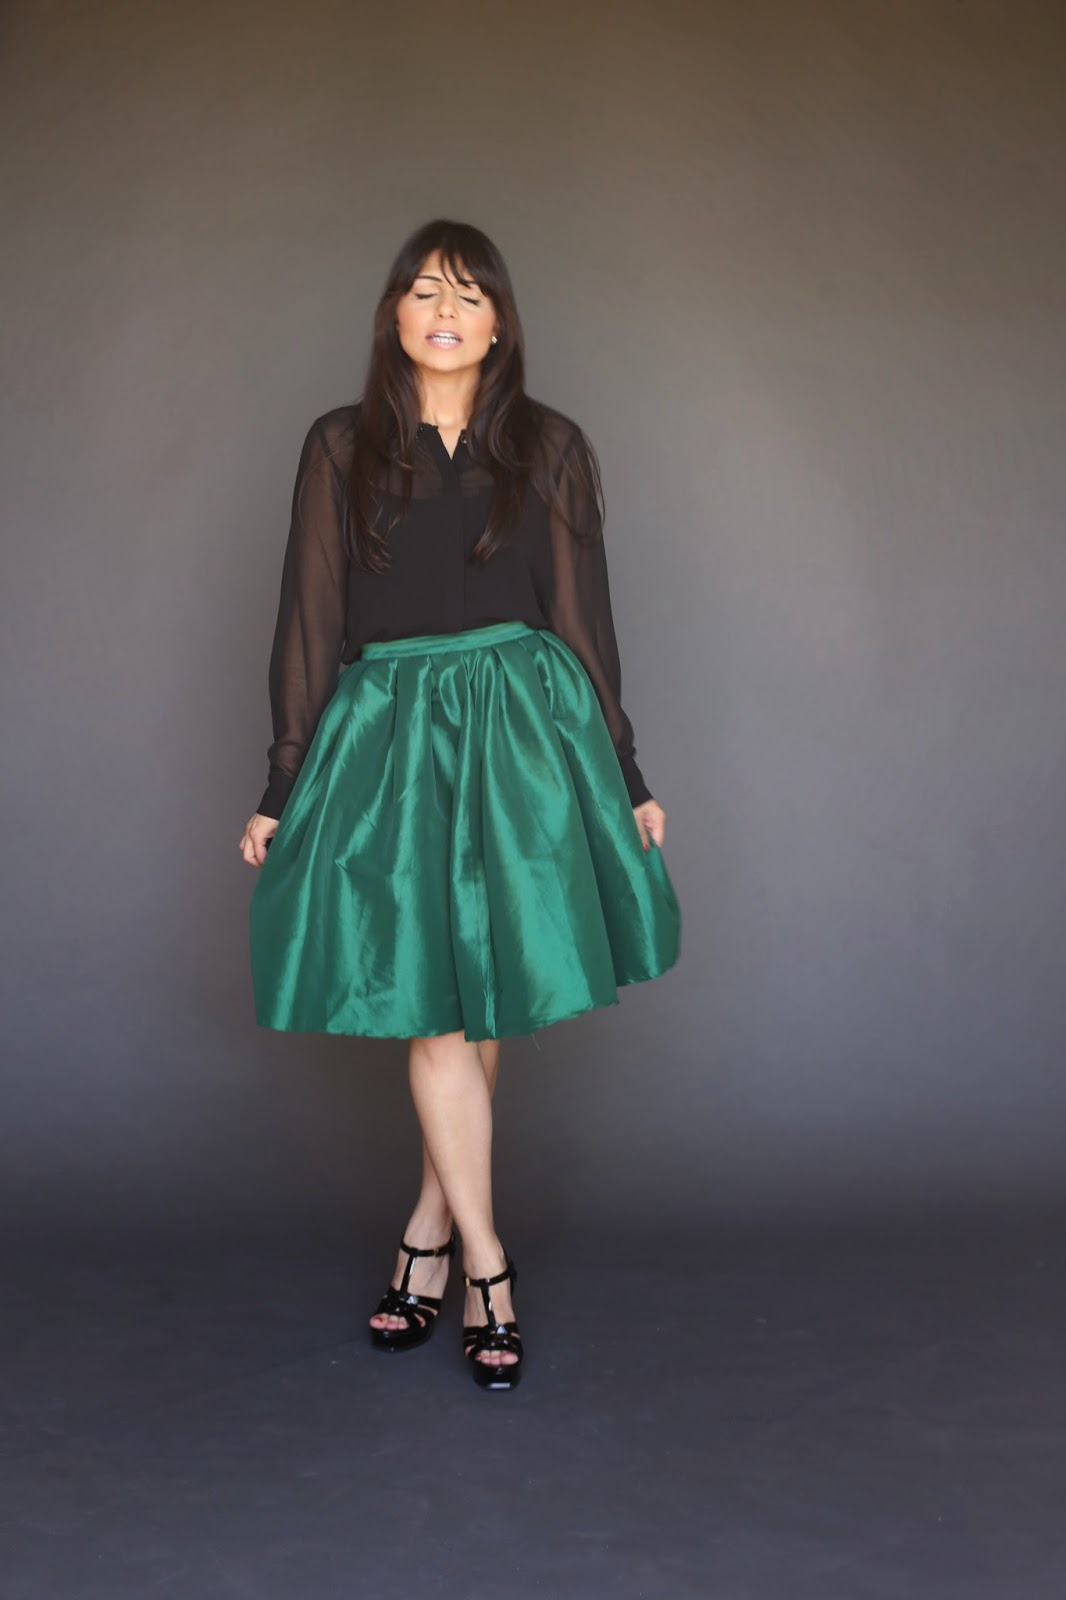 Knee length full metalic emerald green skirt modest tznius mormon lds pentecostal stylish fashionable Mode-sty